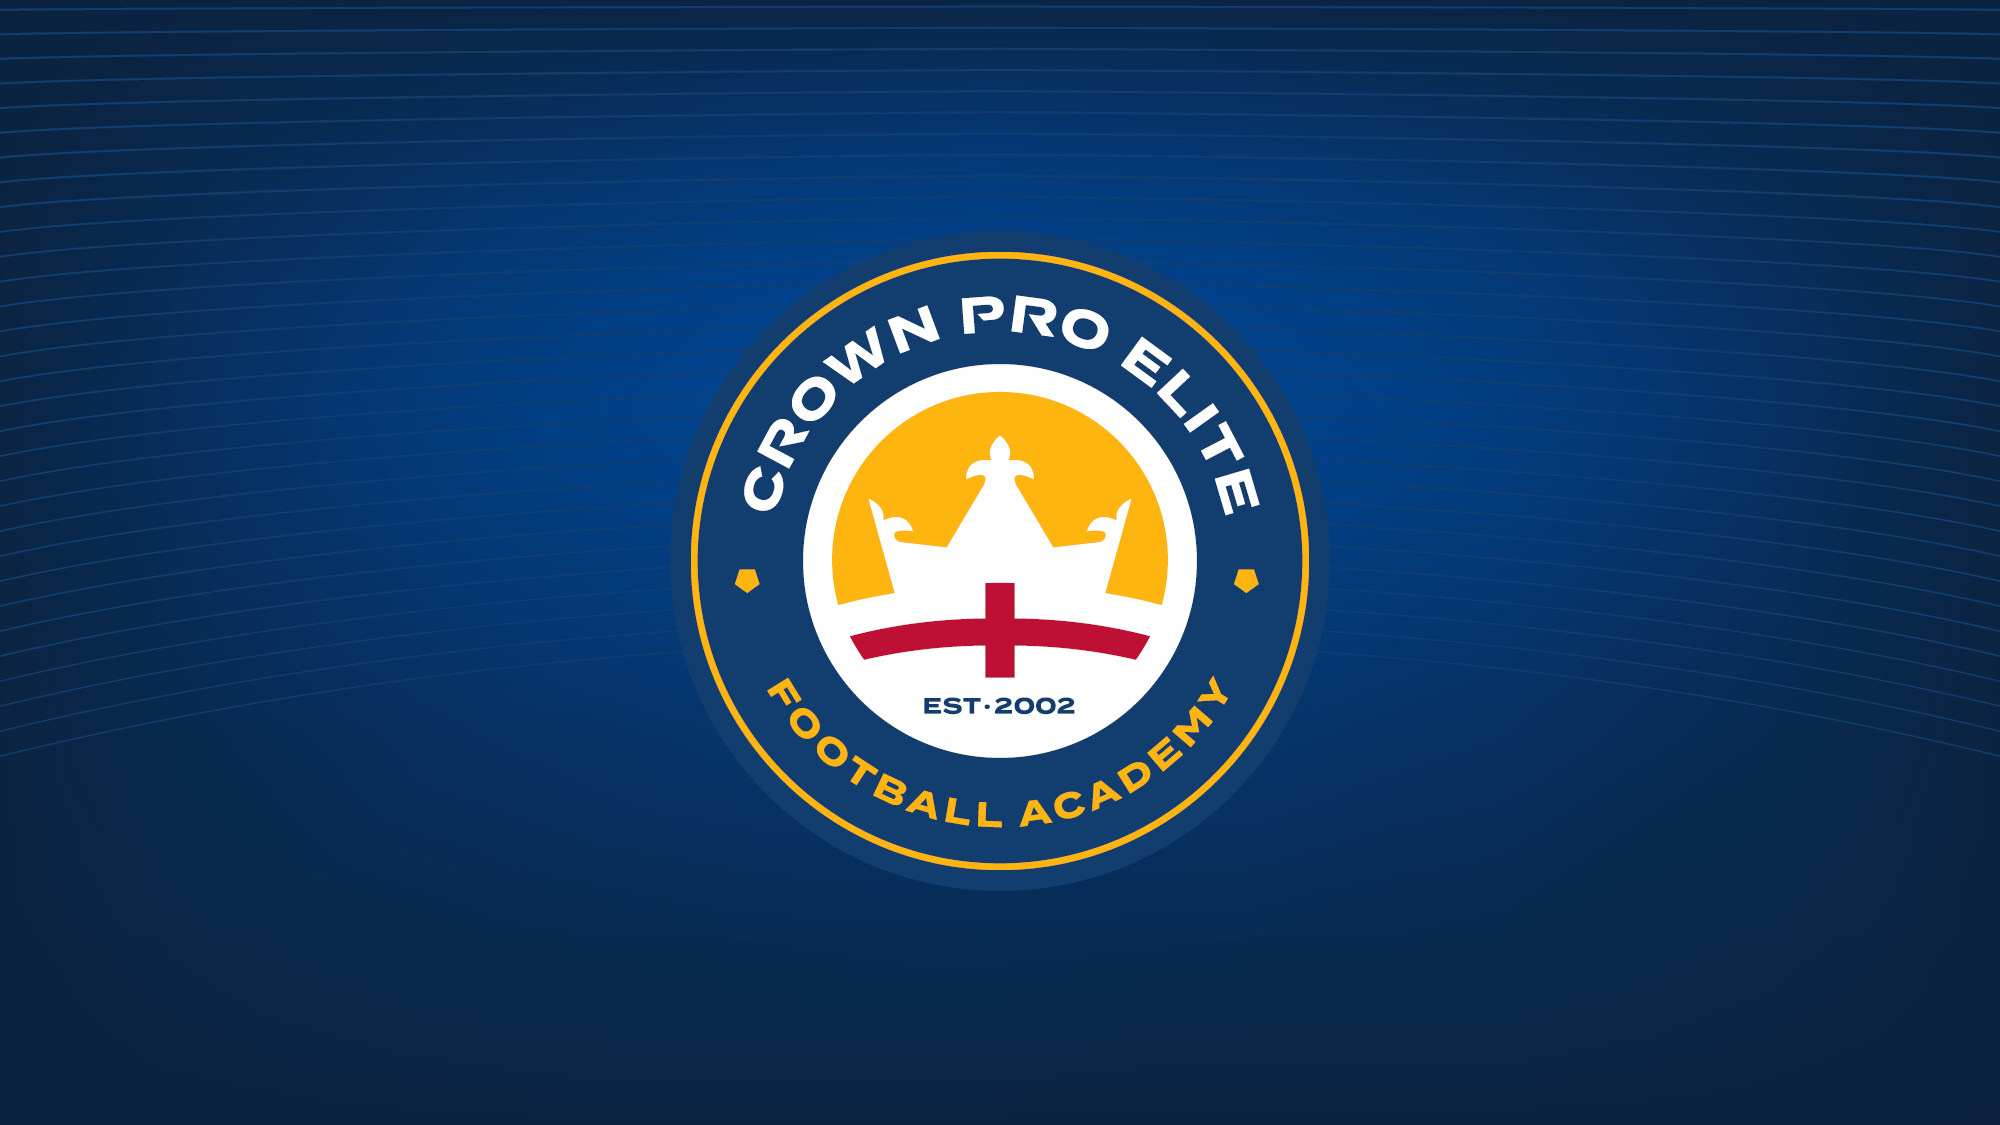 Crown Pro Elite Football Academy